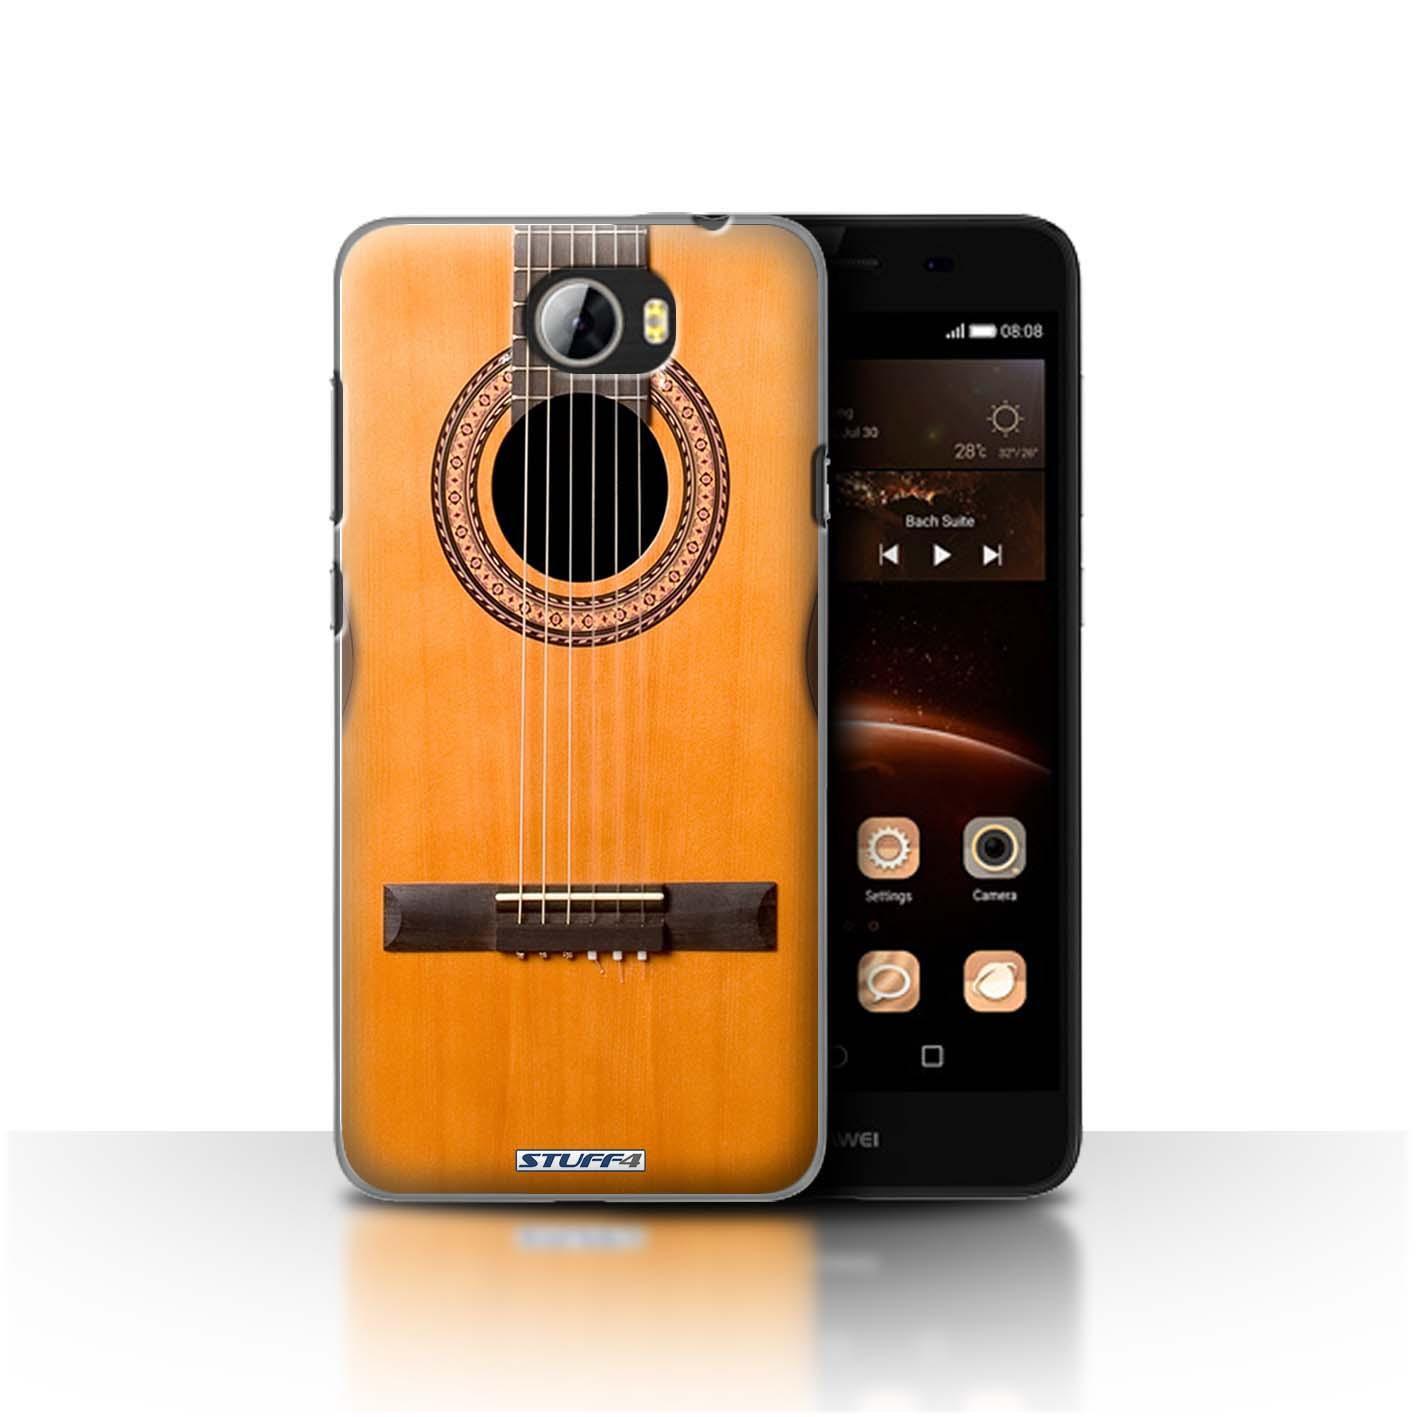 wood wooden acoustic guitar design for huawei y5ii y5 2 clear hard